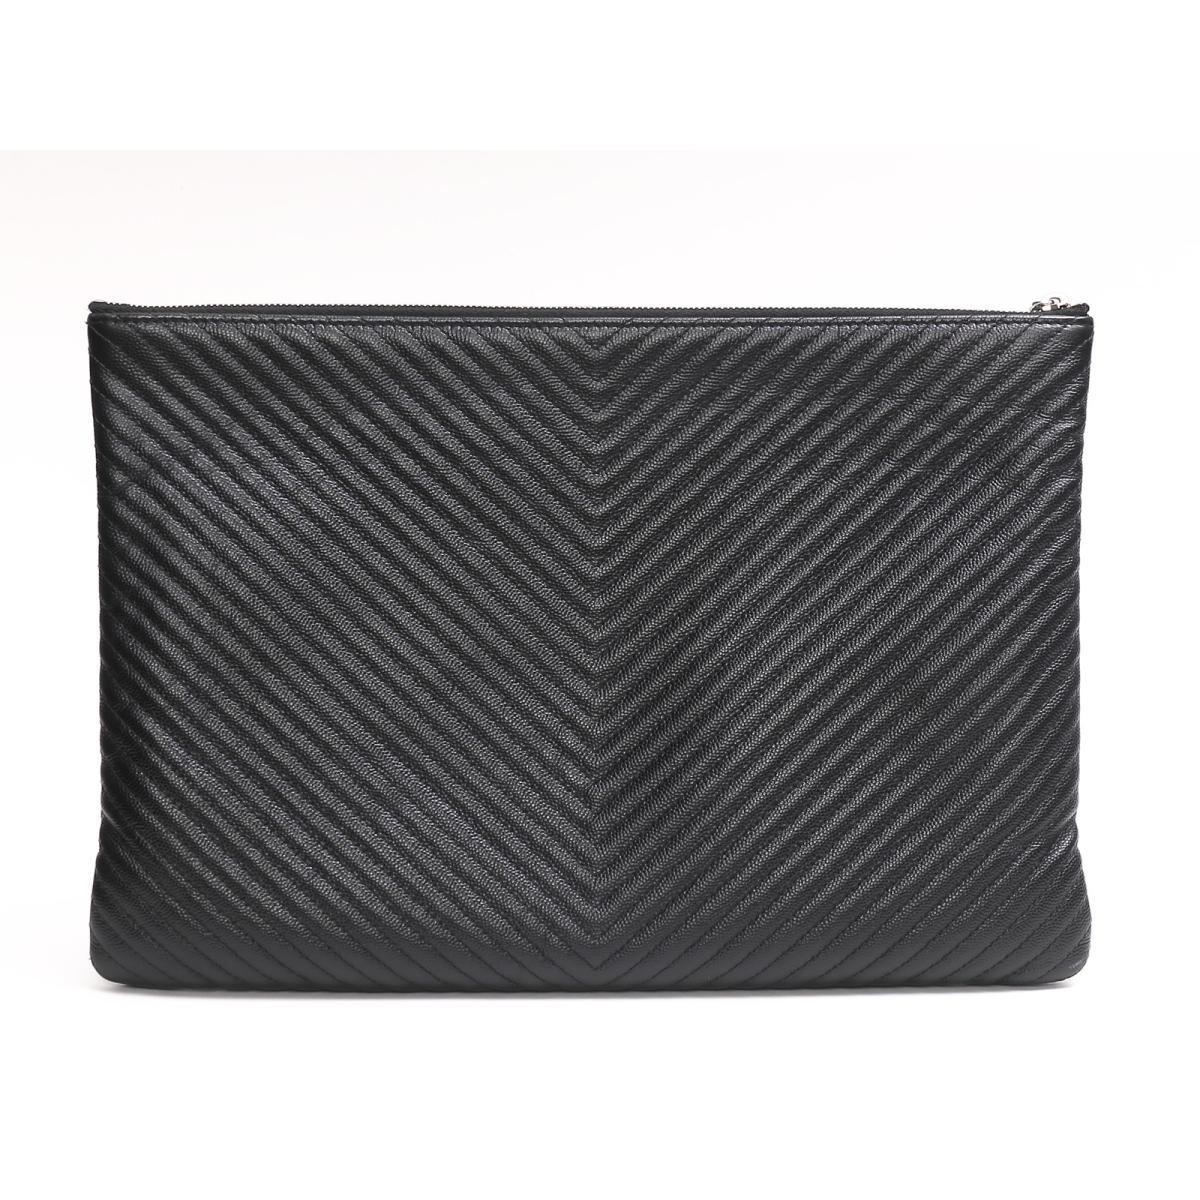 ef431c4ff9c BRANDOFF  Authentic CHANEL Clutch Bag Caviar Leather Black   Rakuten ...